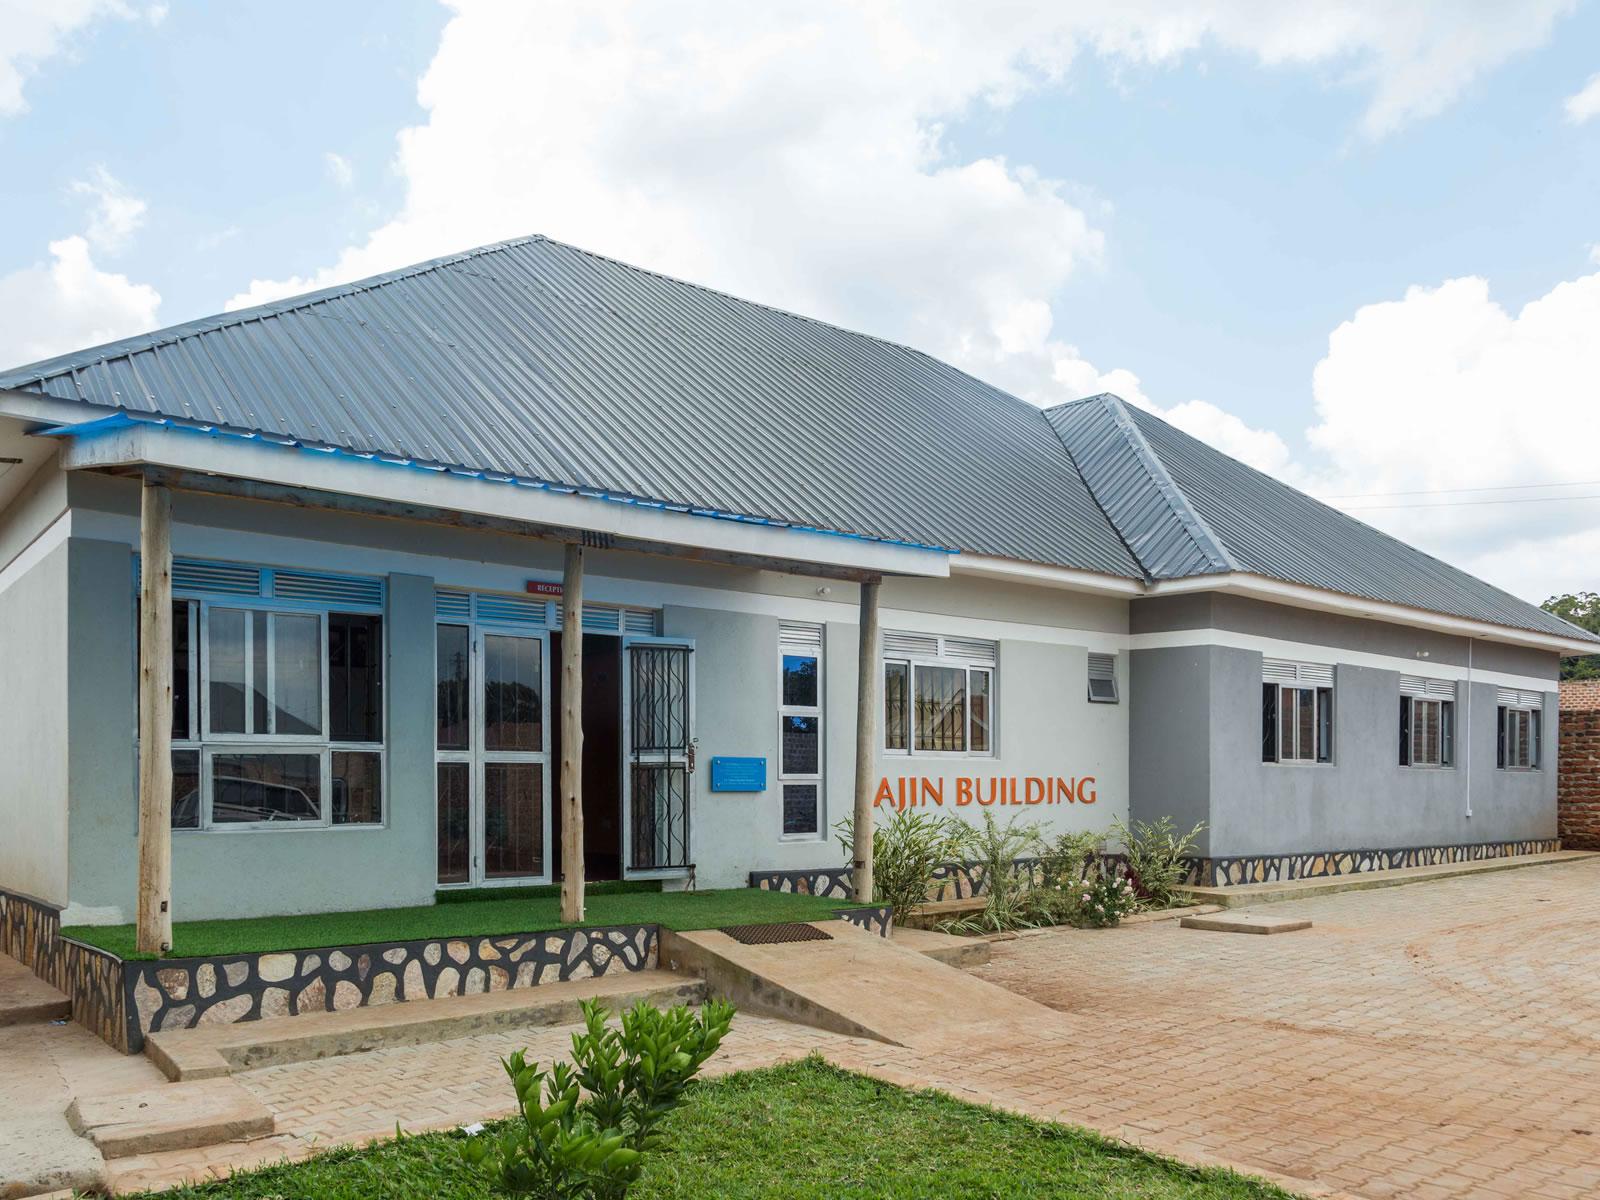 Partners for Community Development office building